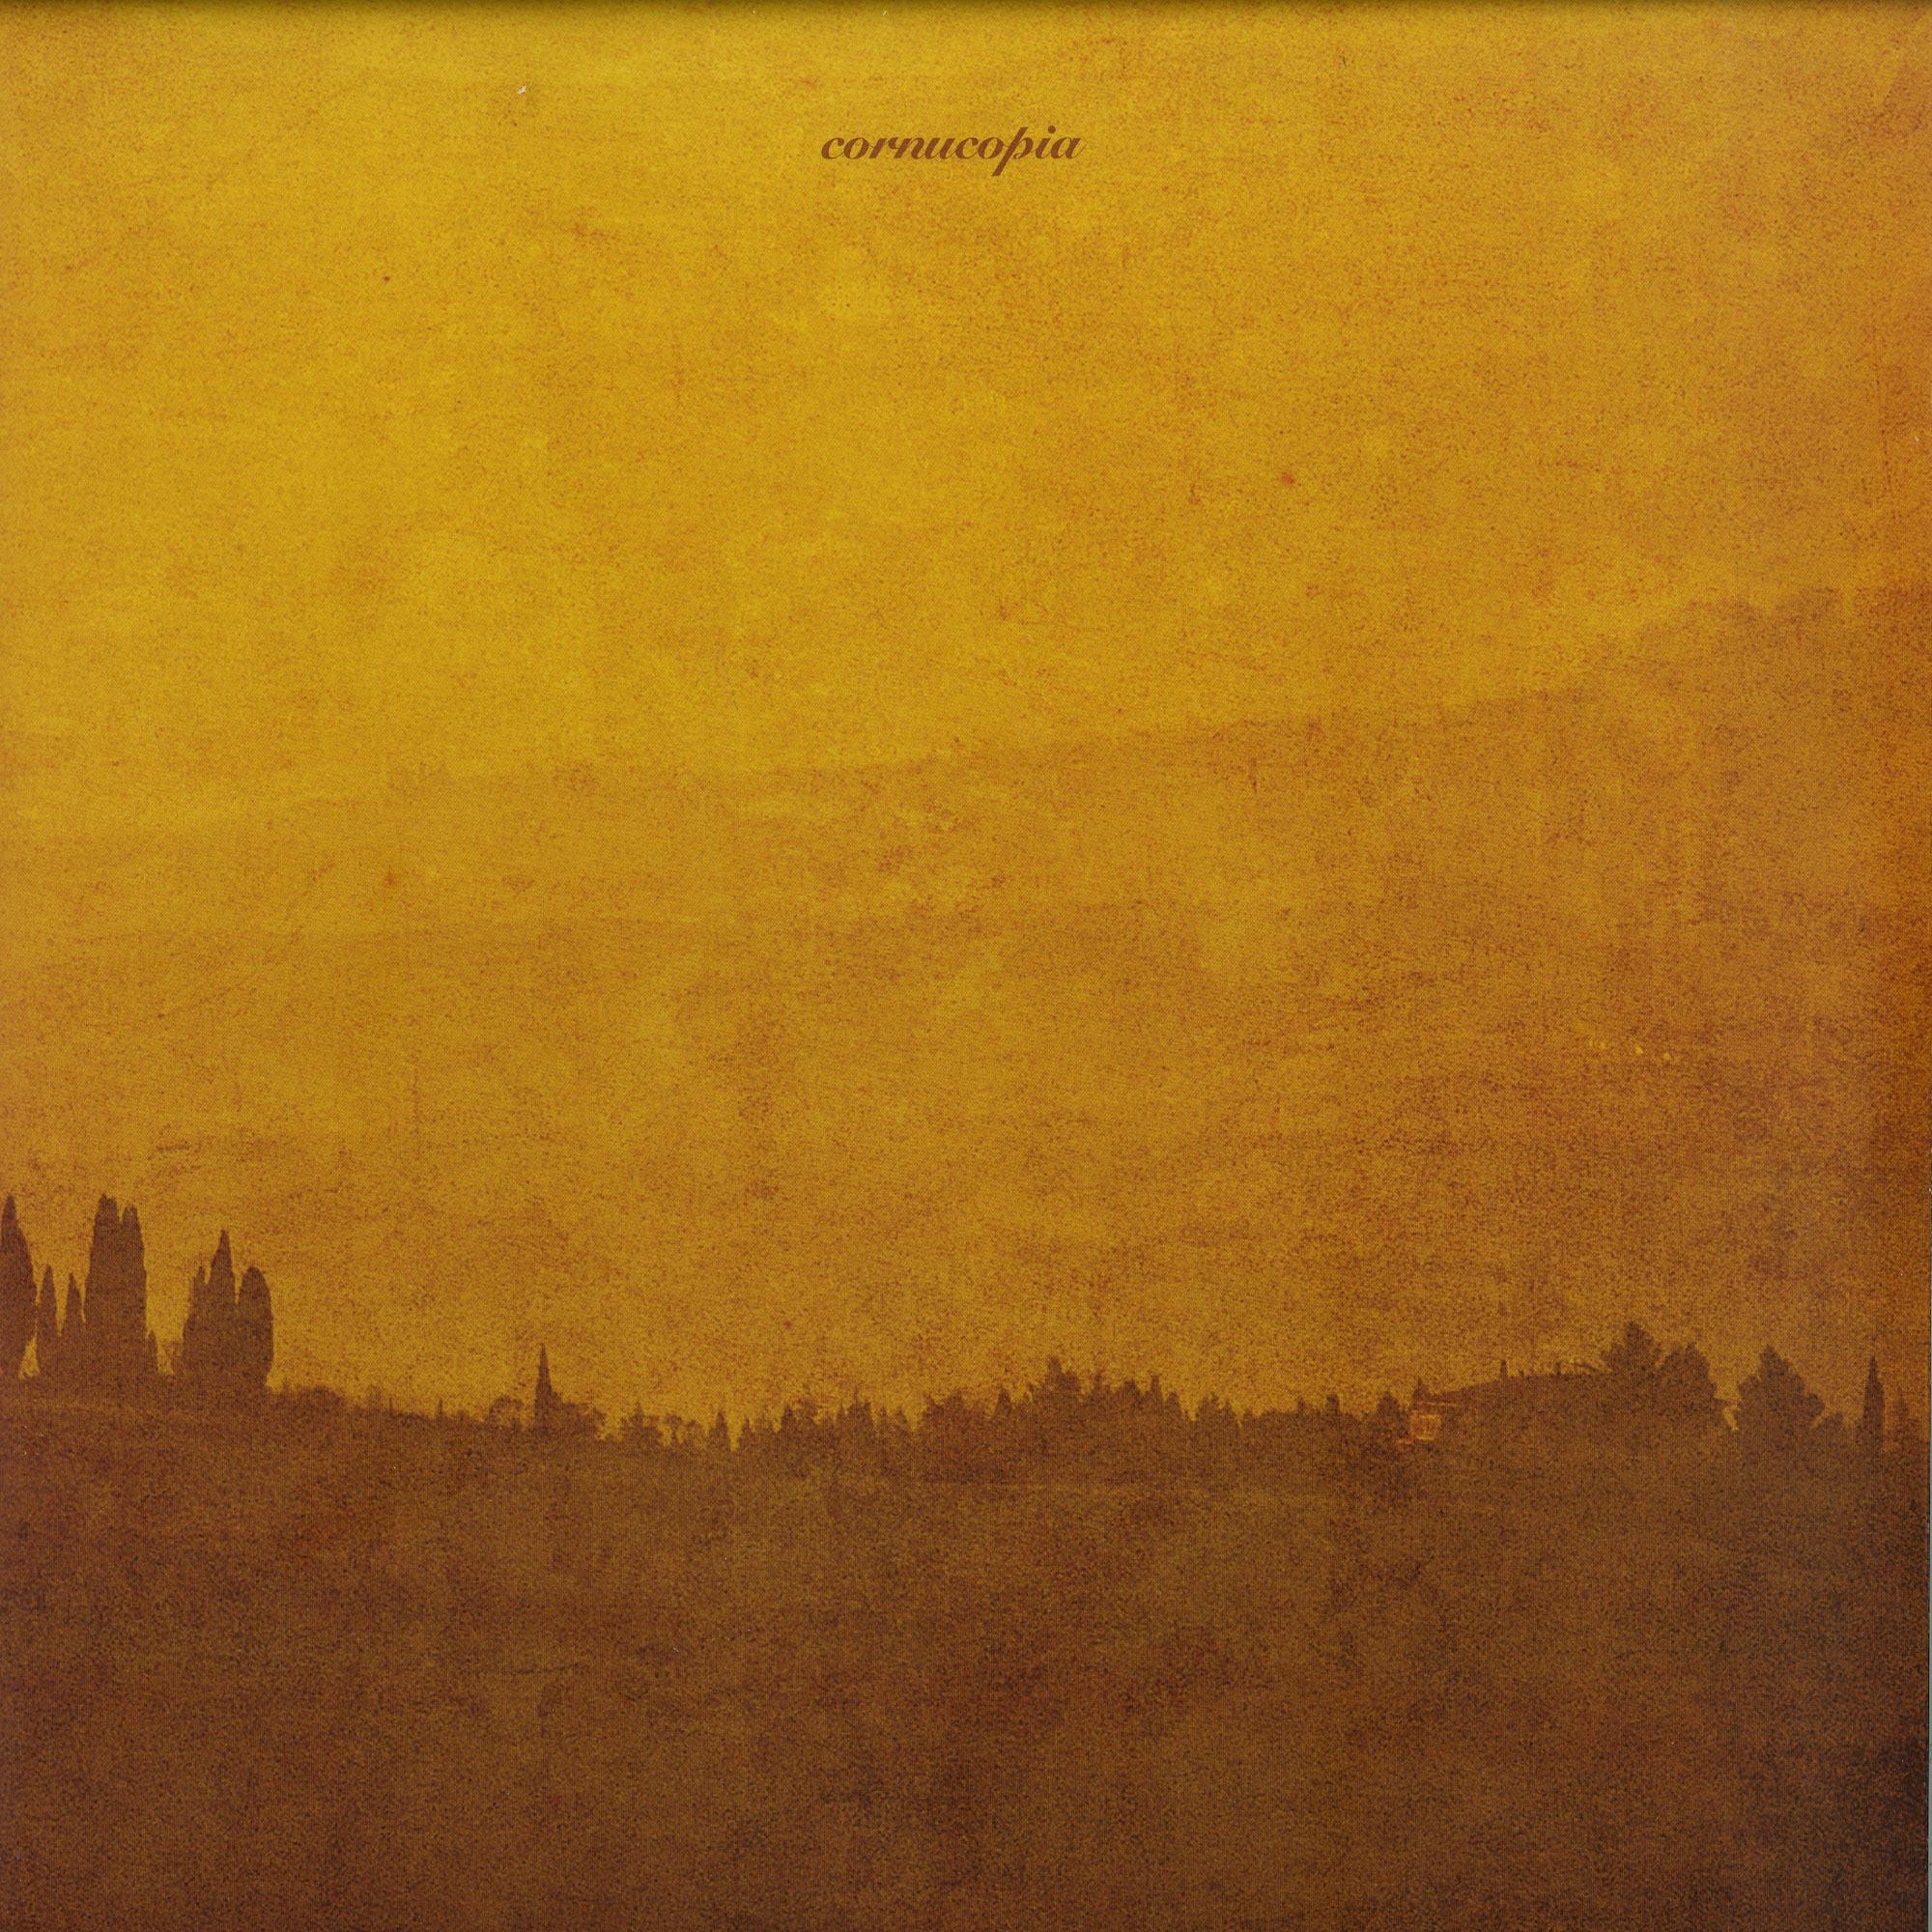 Cornucopia - PURSUIT OF THE ORANGE BUTTERFLY EP